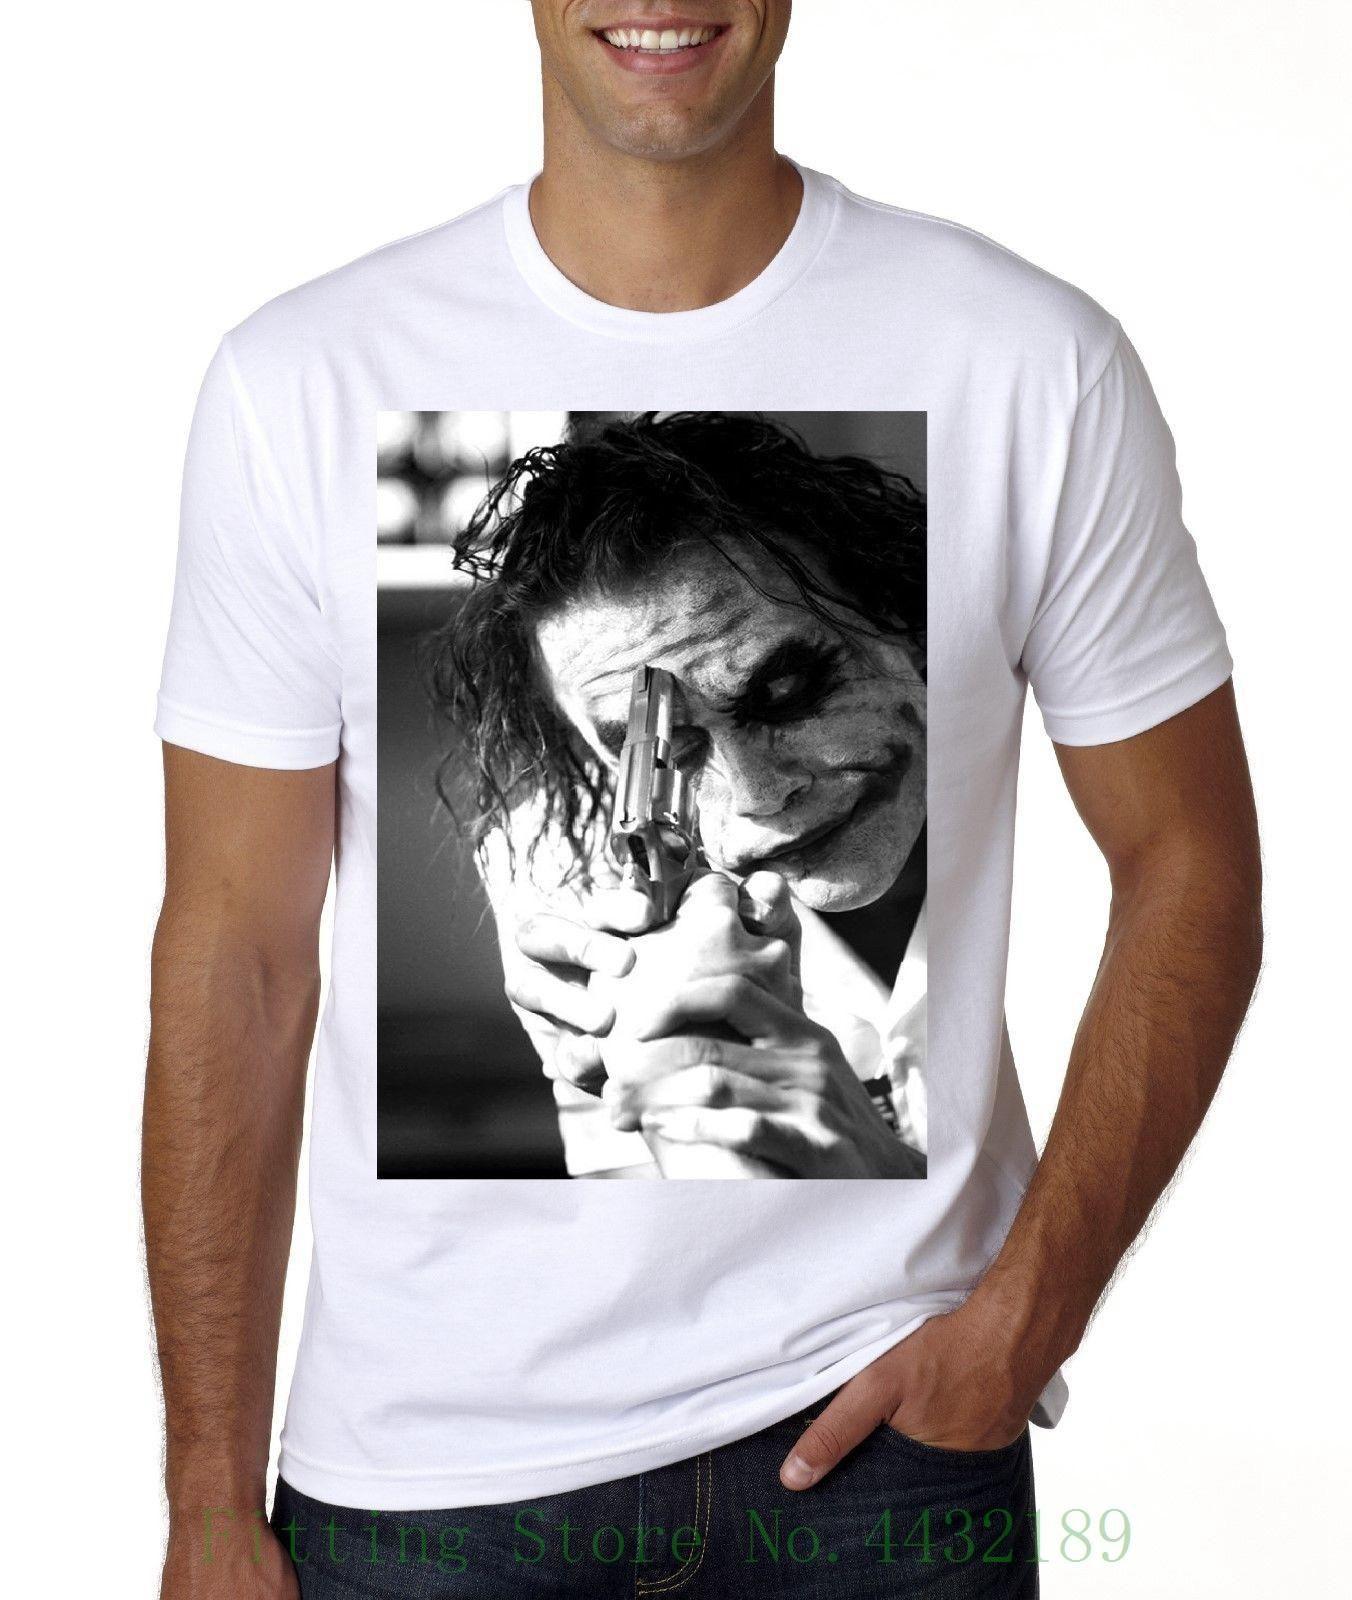 497f8720 Joker Heath Ledger Gun T Shirt Sizes From Med 3xl Cotton Casual Shirt White  Top Humor T Shirts Funky T Shirt From Yubin05, $14.15  DHgate.Com